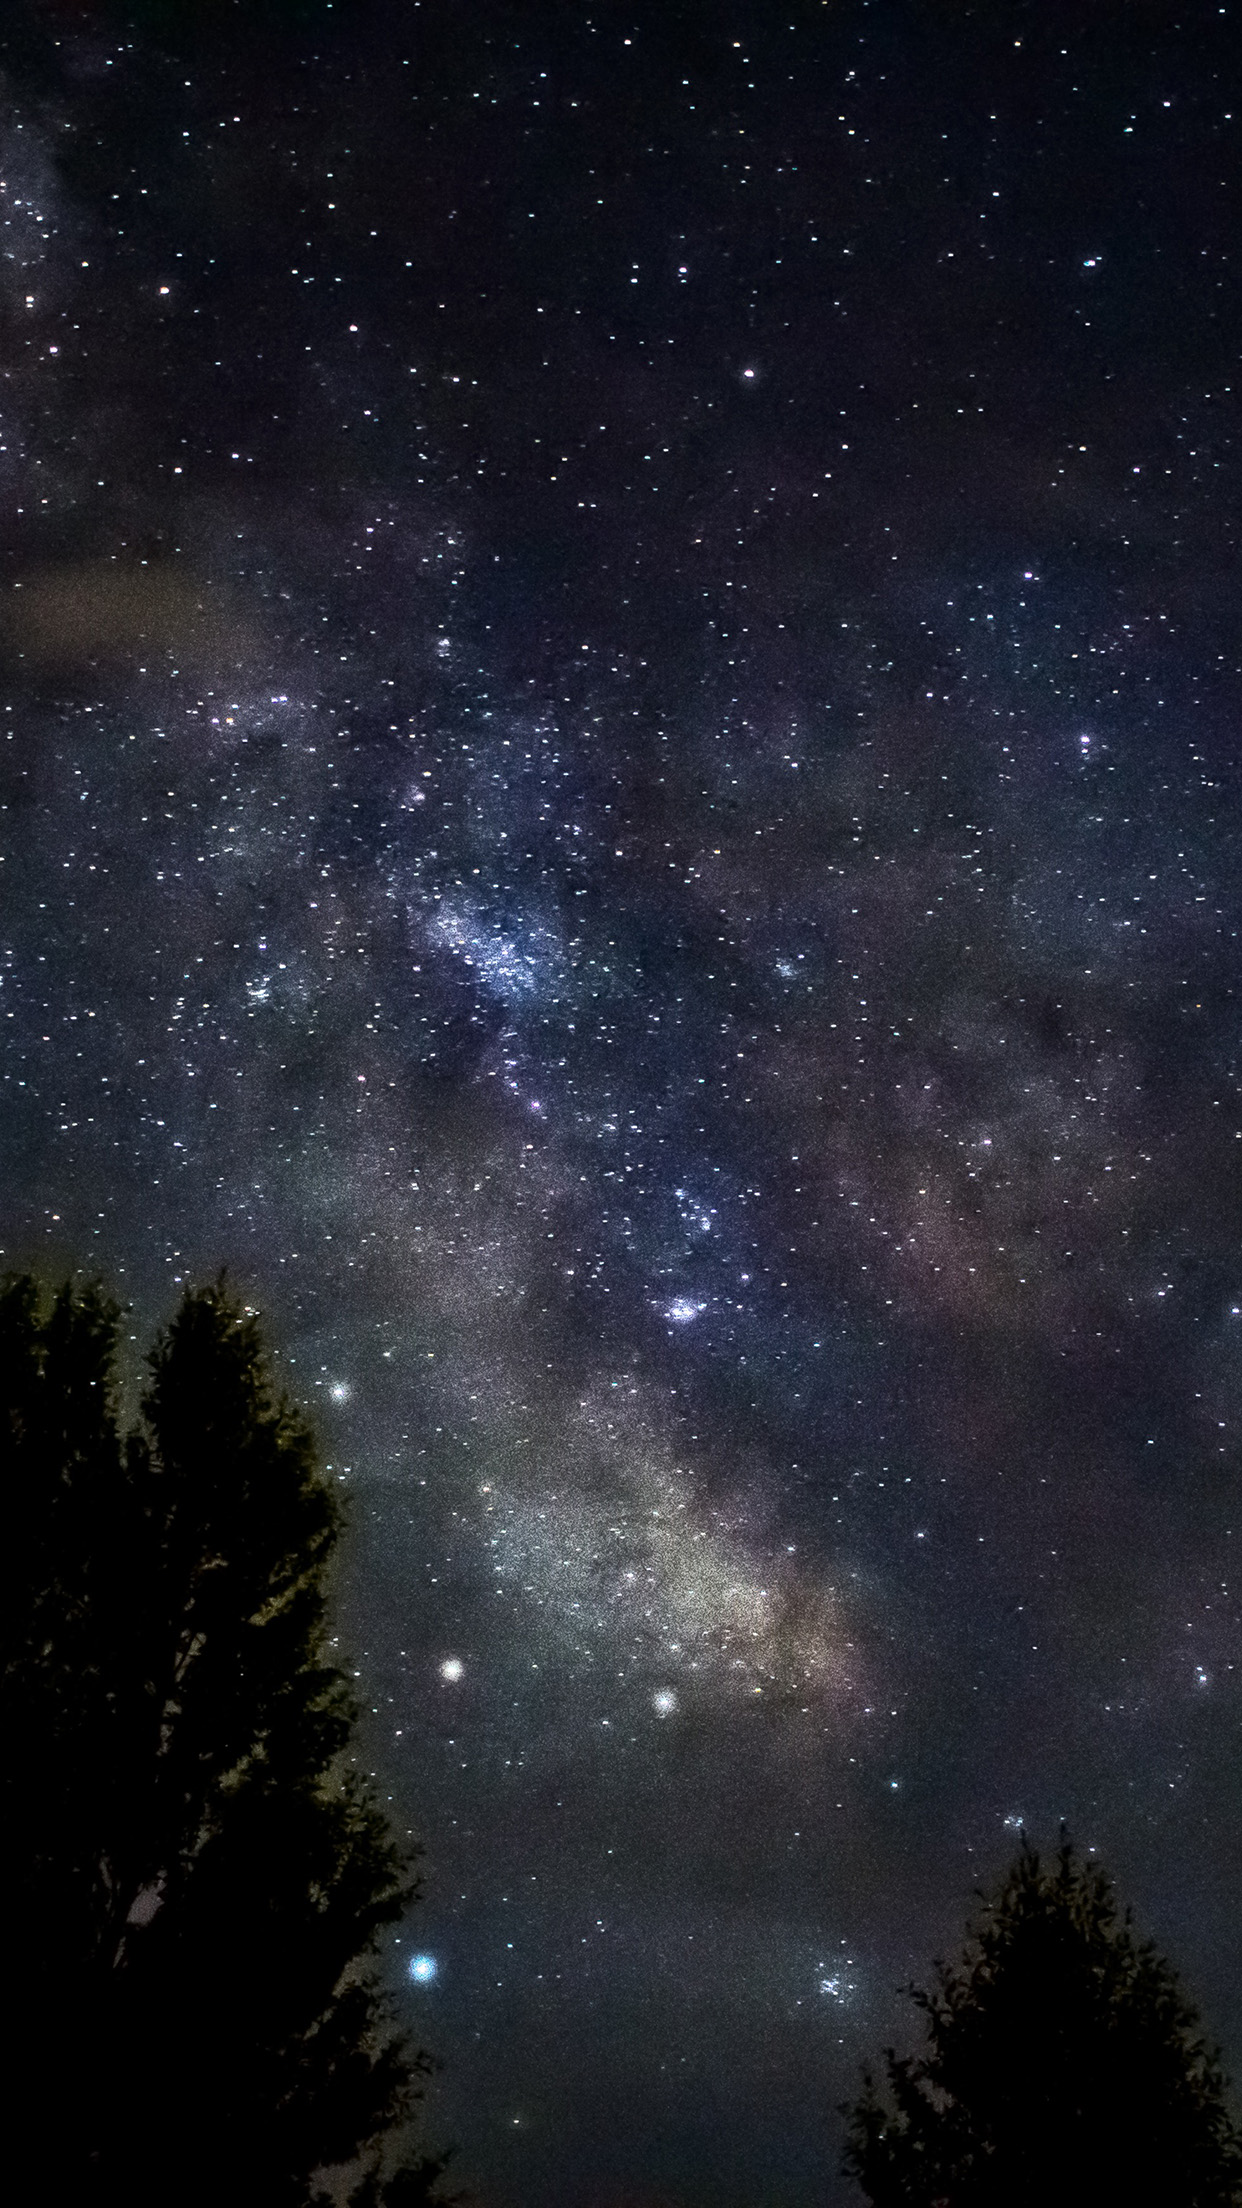 Iphone7papers Com Iphone7 Wallpaper Oc93 Sky Galaxy Star